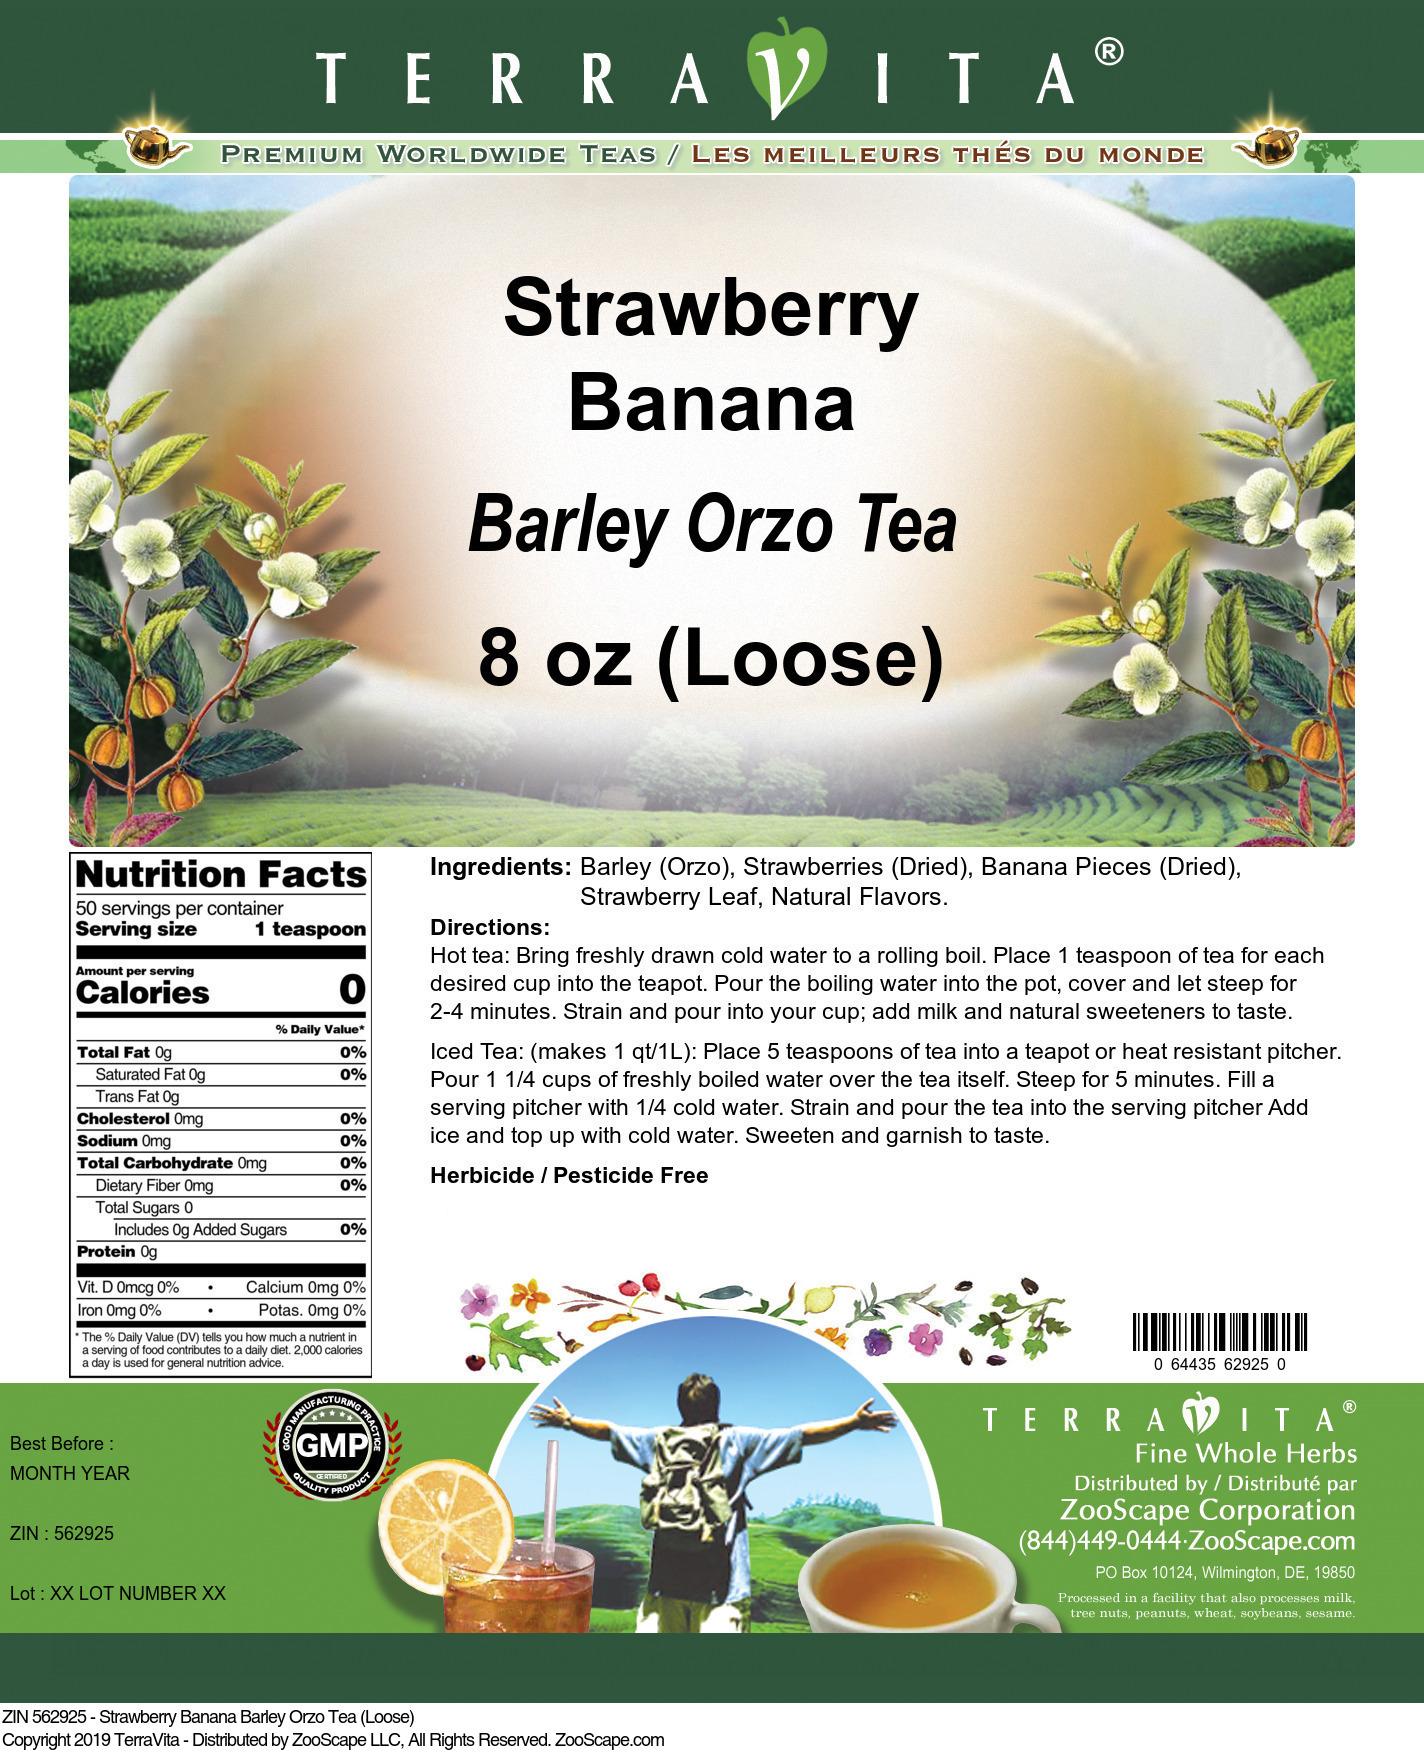 Strawberry Banana Barley Orzo